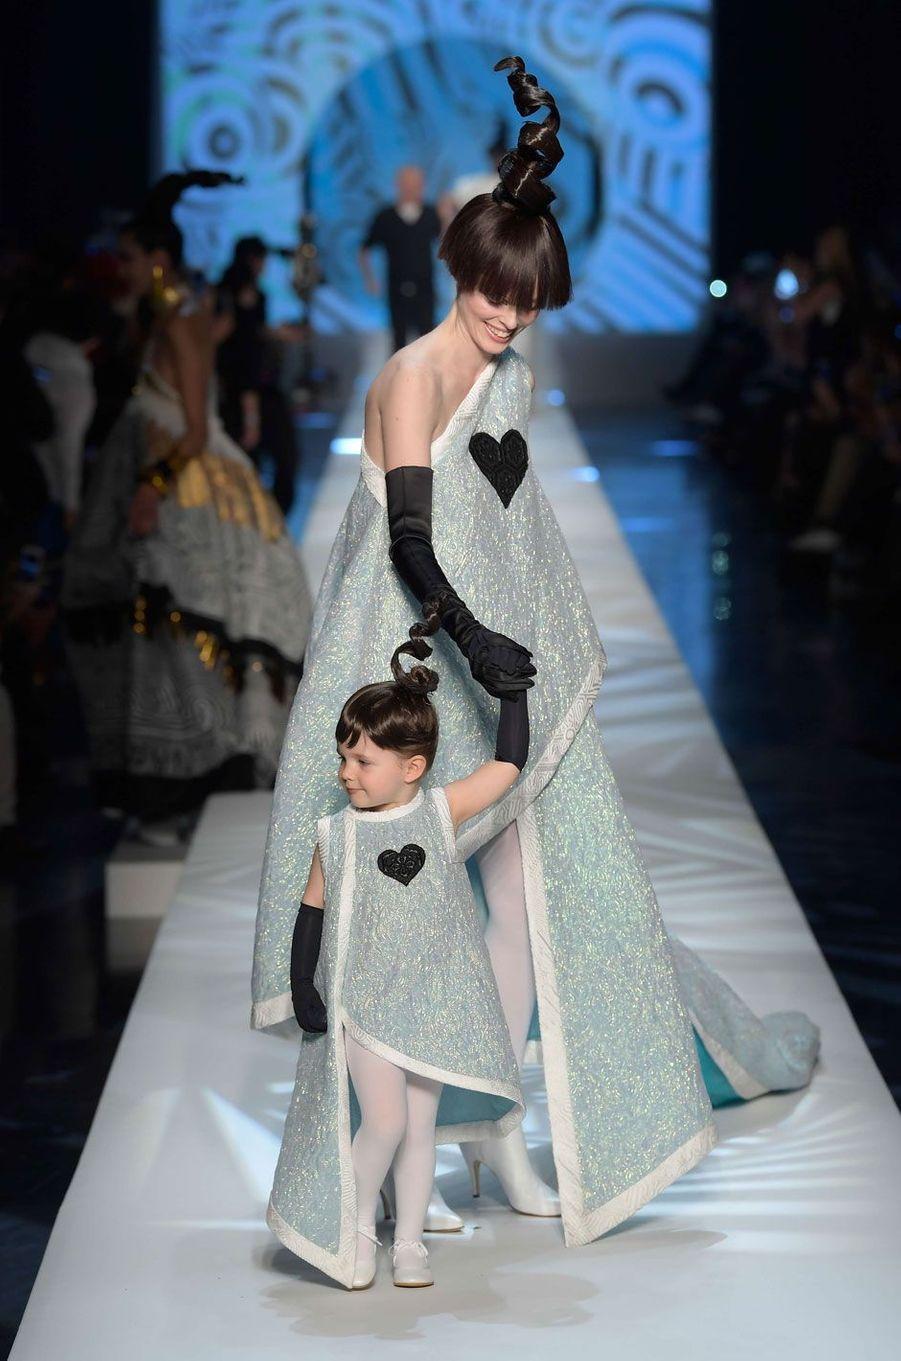 Ioni Conran et sa maman Coco Rocha, au défilé Jean Paul Gaultier